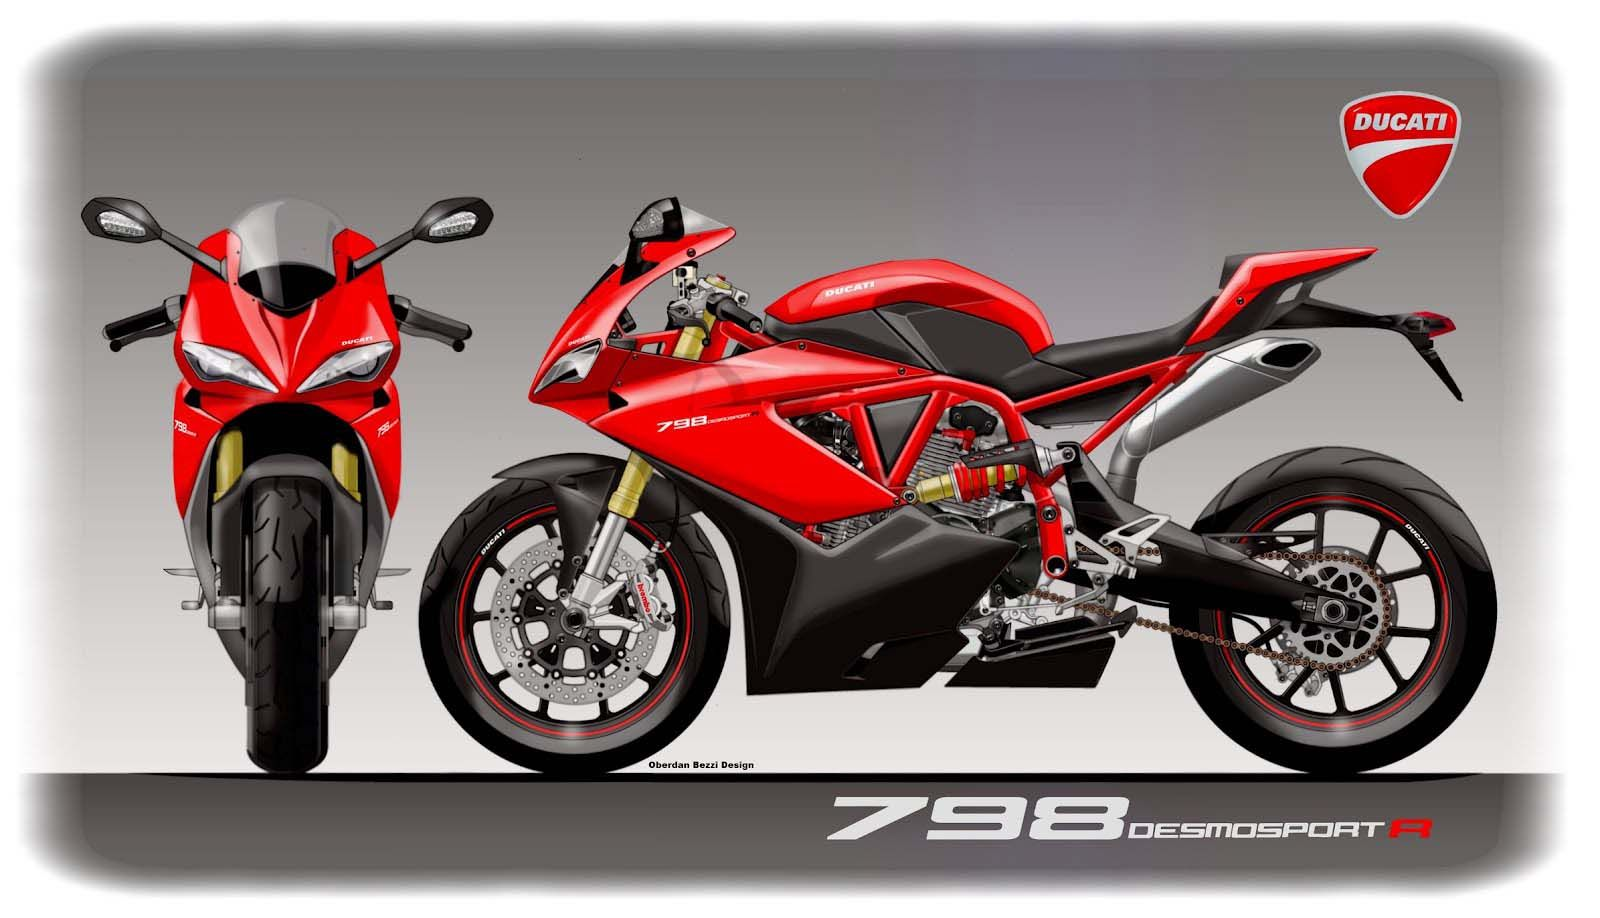 Ducati 798 Desmosport R Concept Ducati Ducati Motorcycles Cool Bikes